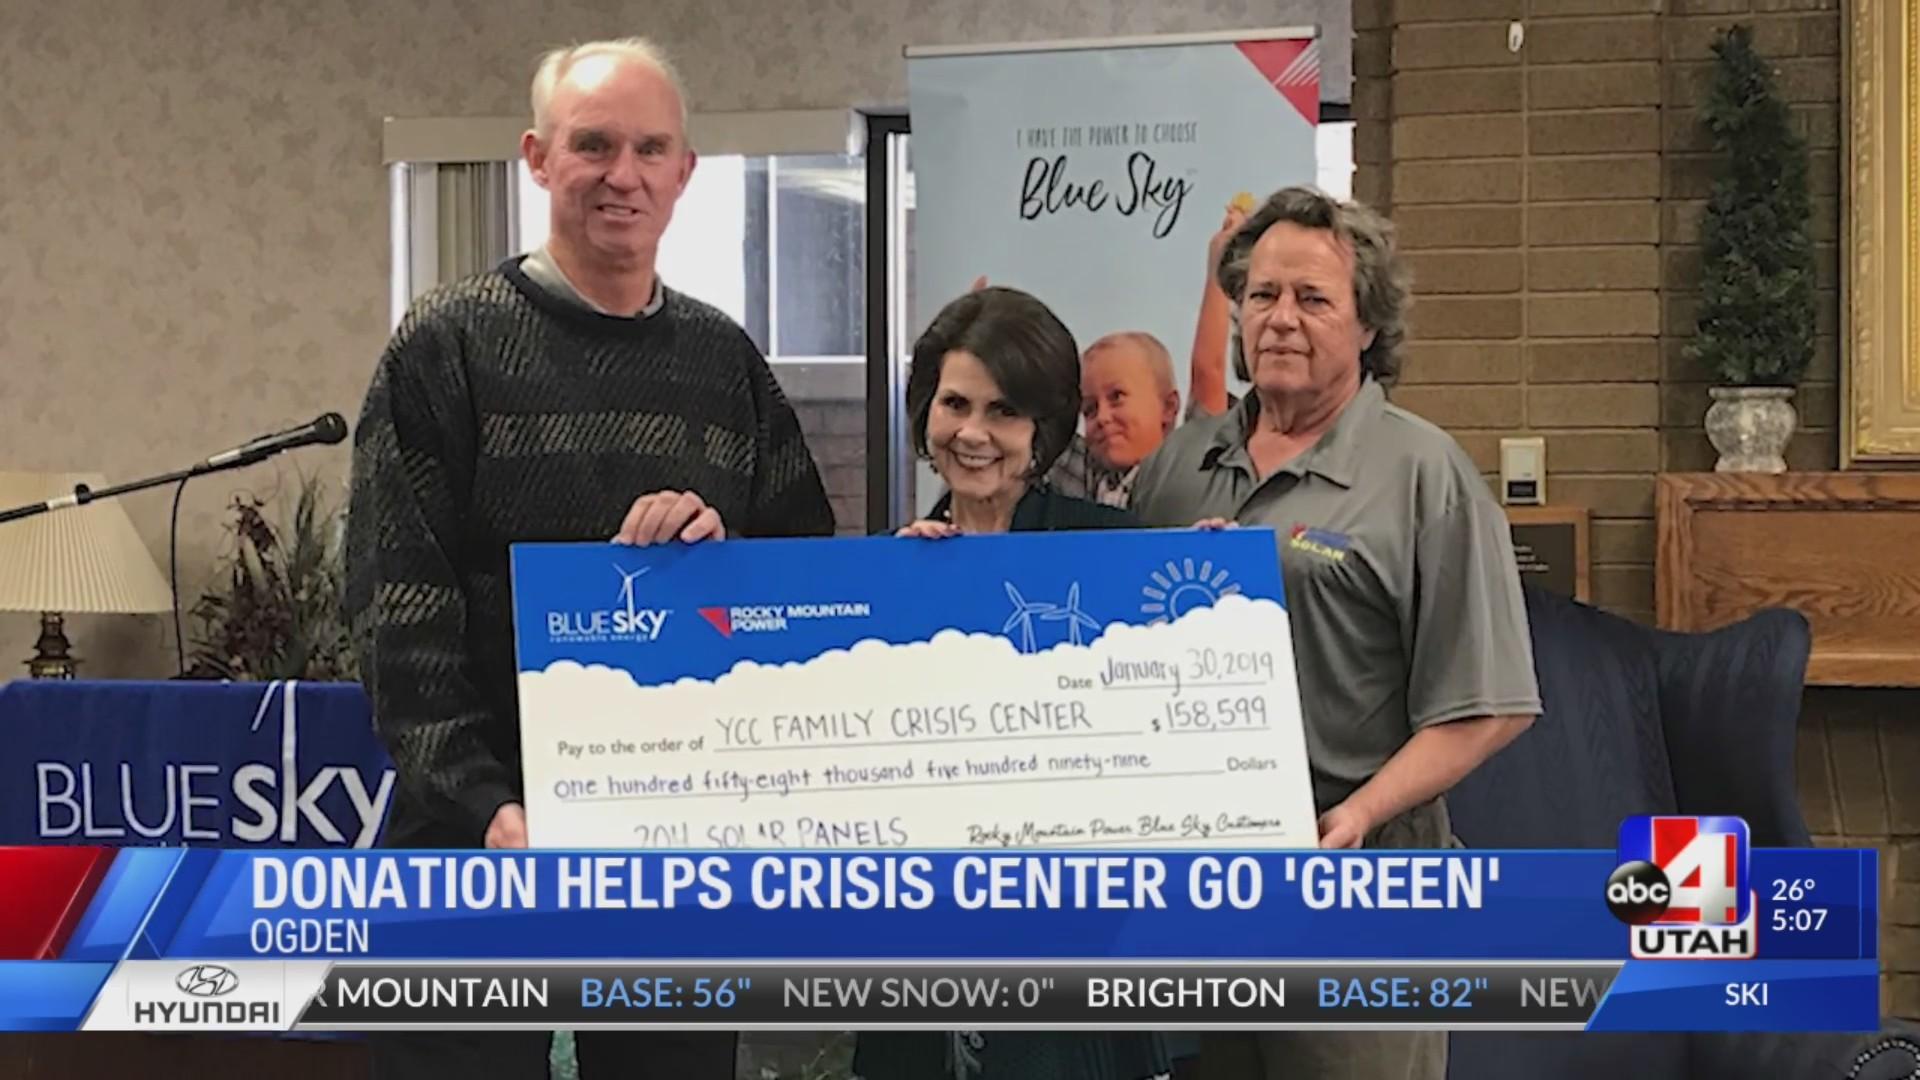 solar donation for crisis center